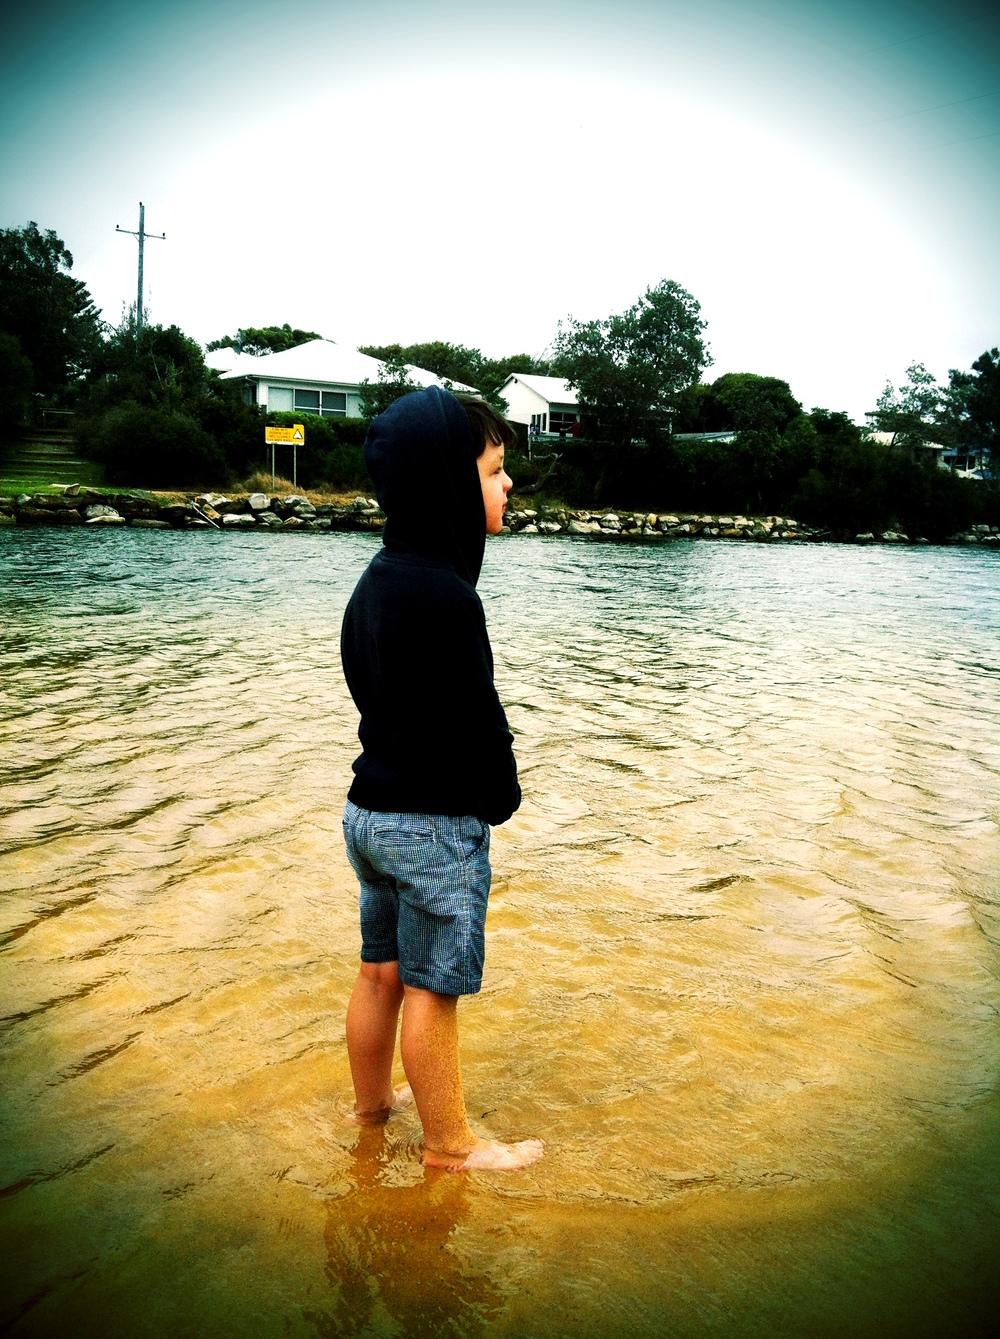 Pondering Life